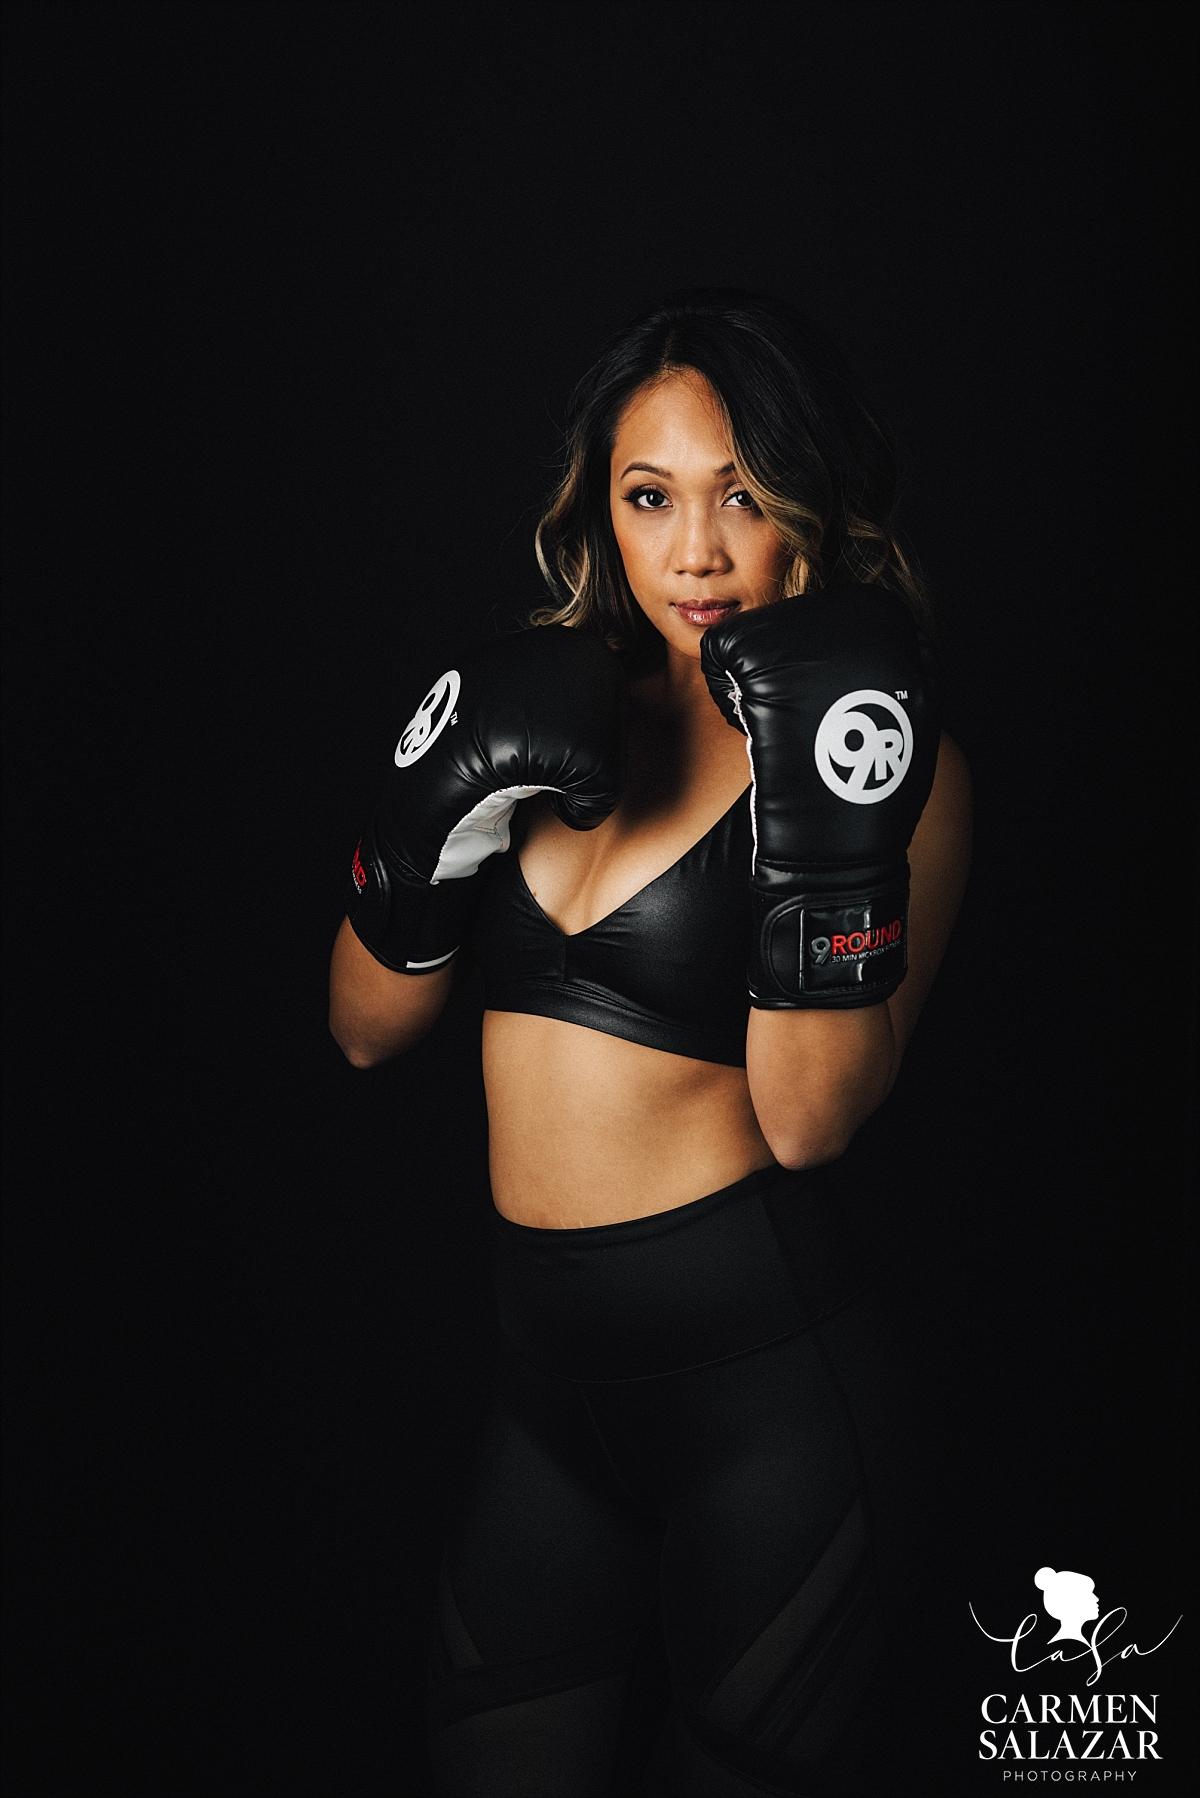 Female boxing fitness portraits - Carmen Salazar